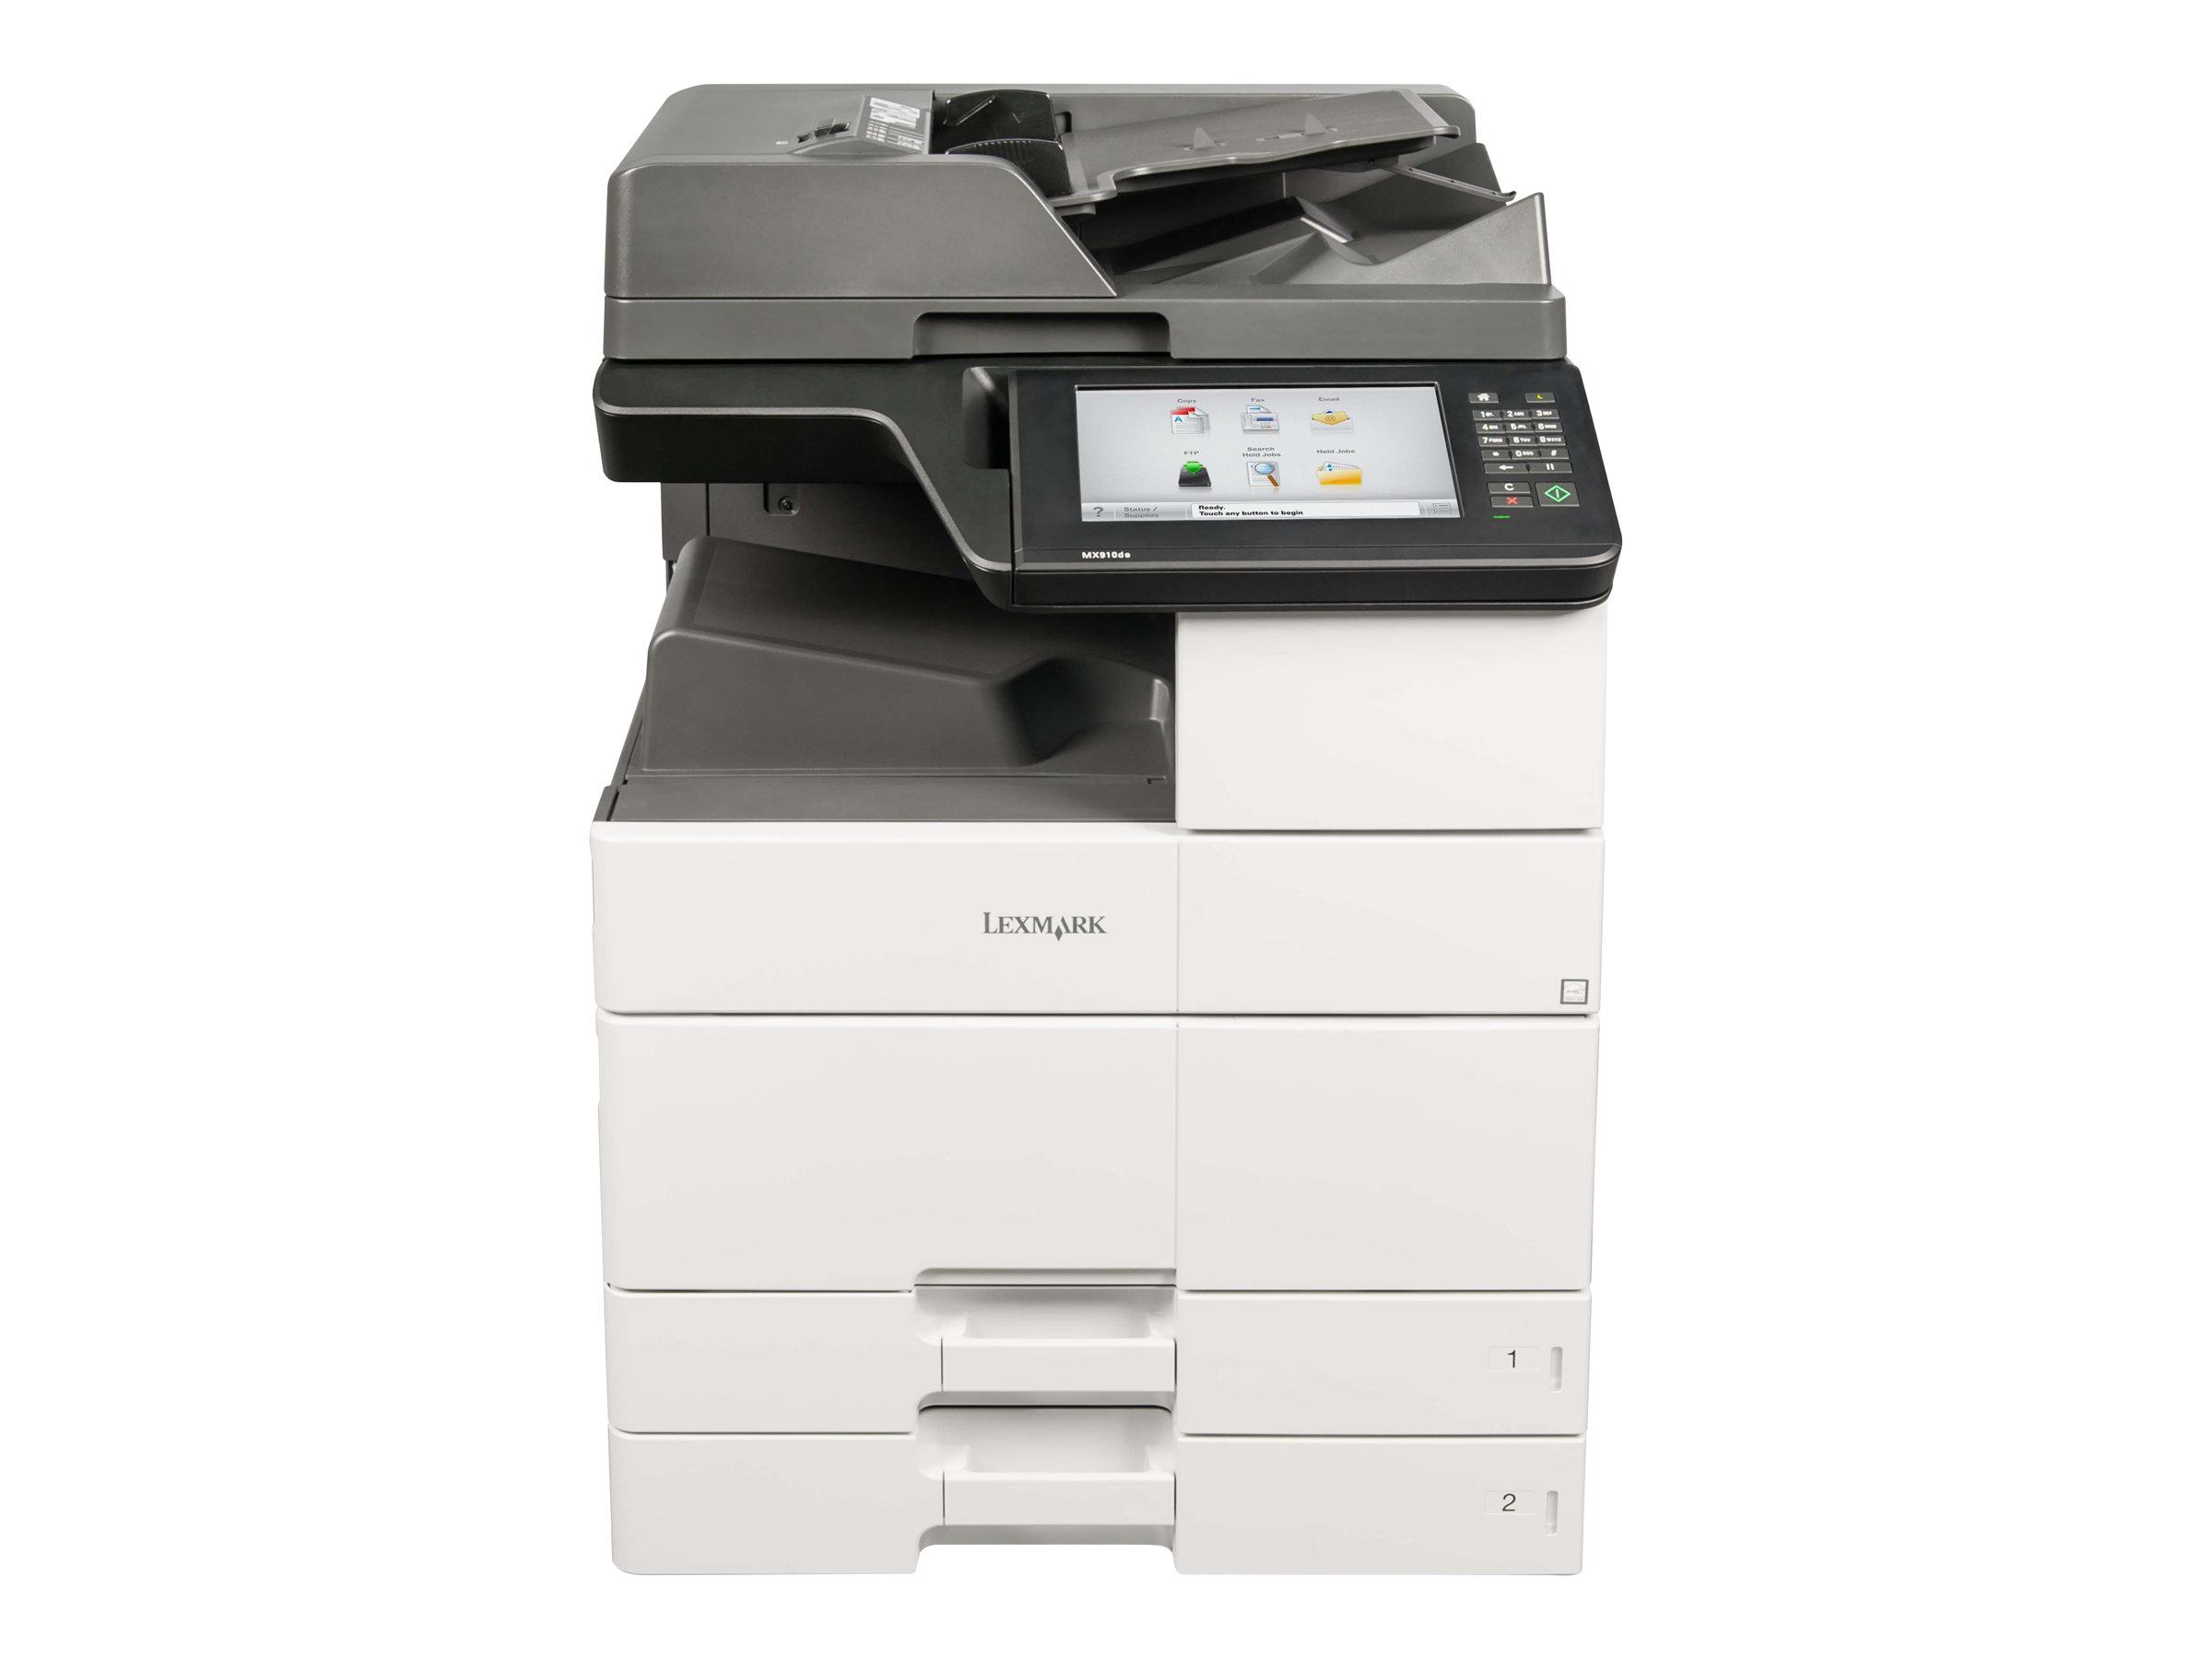 Lexmark MX910de - Multifunktionsdrucker - s/w - Laser - 297 x 432 mm (Original)